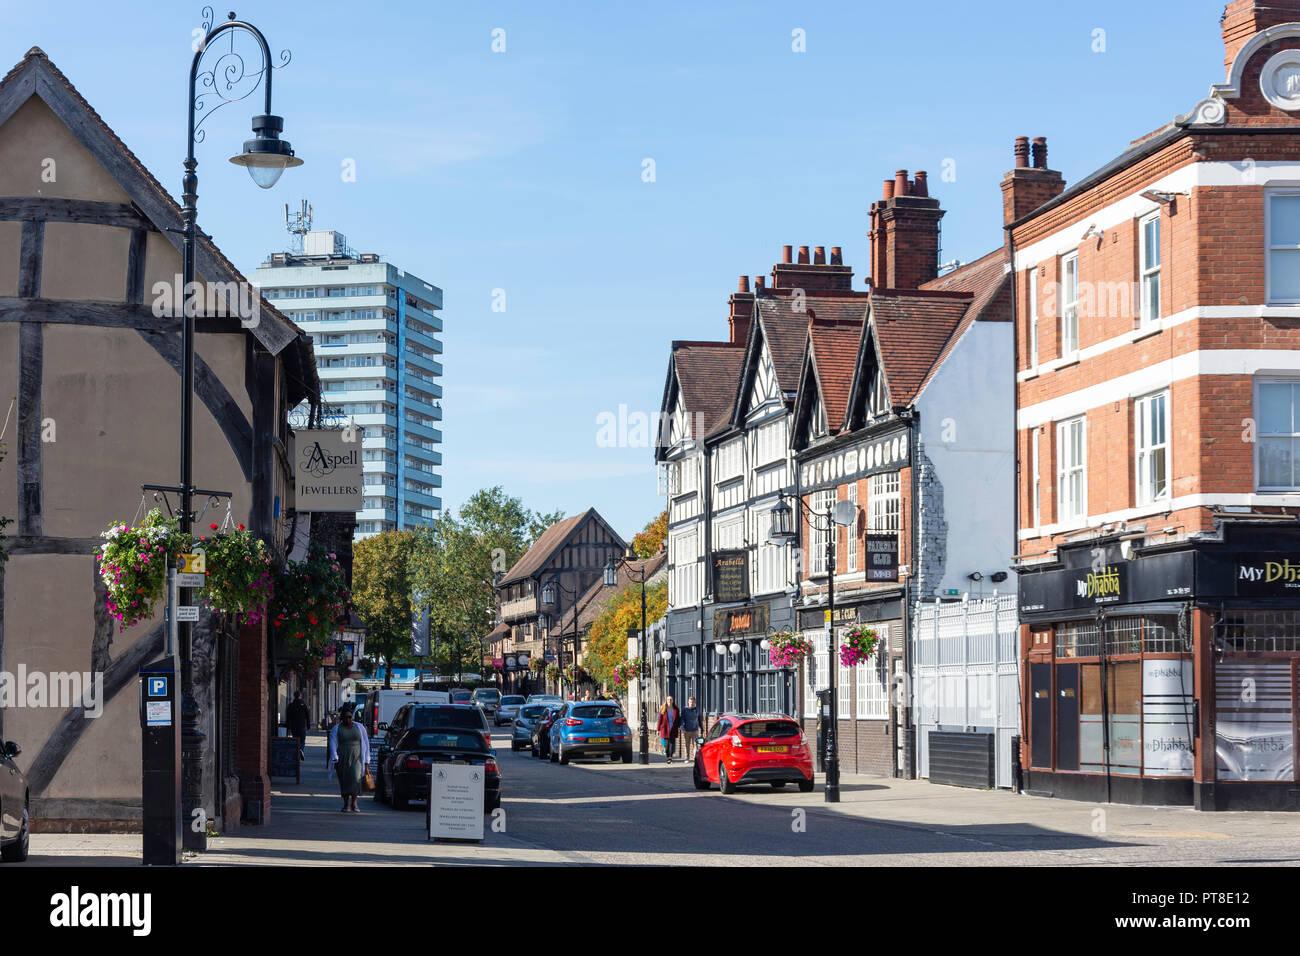 Spon Street, Coventry, West Midlands, England, United Kingdom - Stock Image